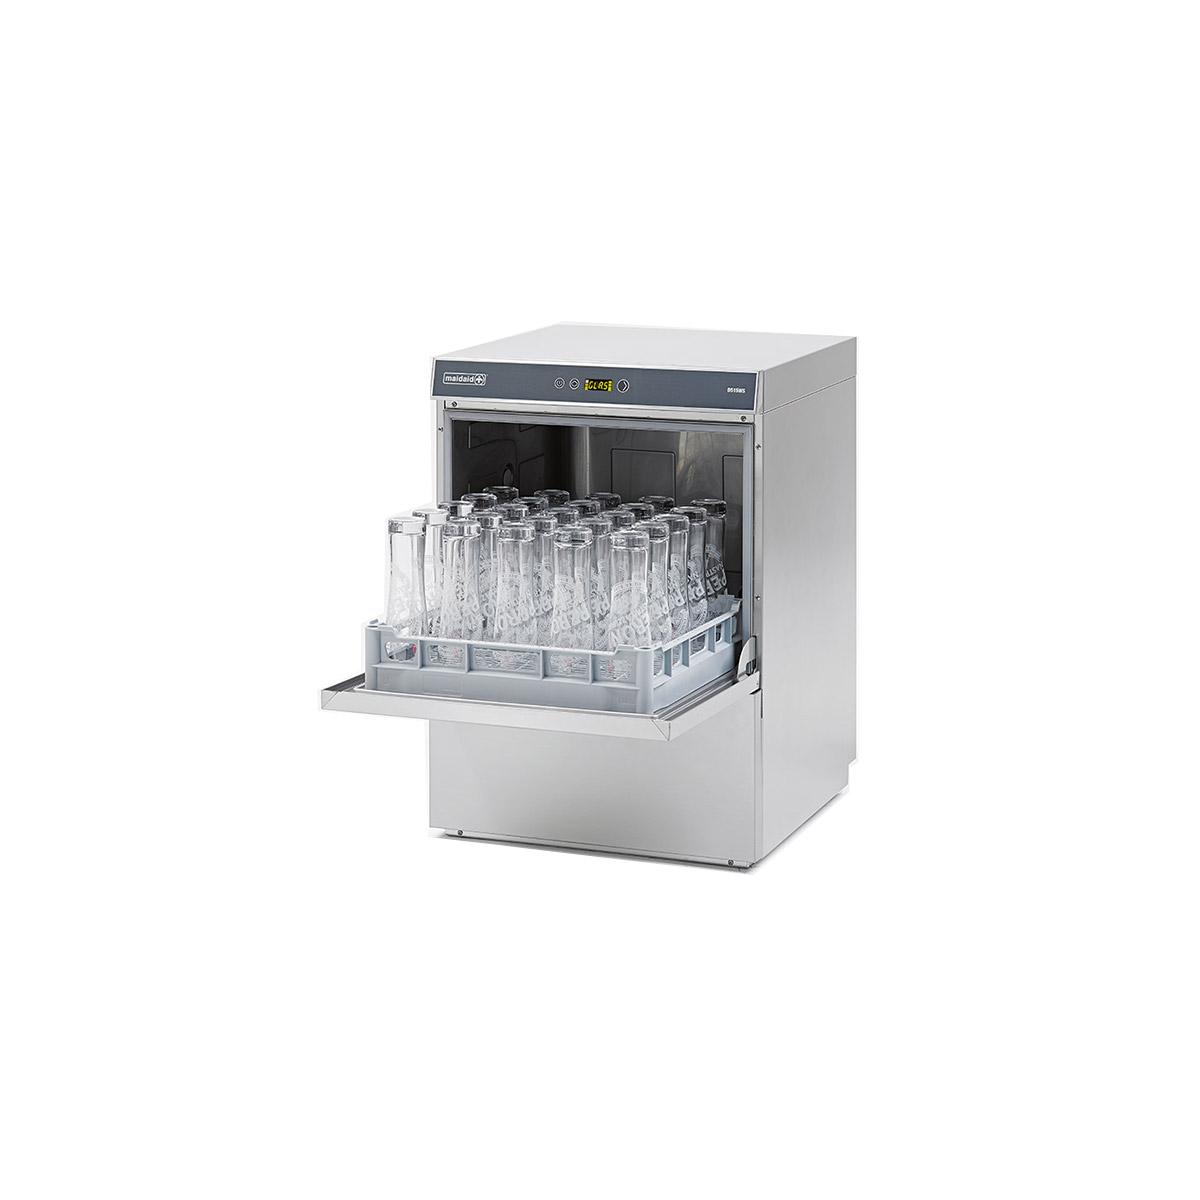 Maidaid Halcyon Dishwasher D515 WS